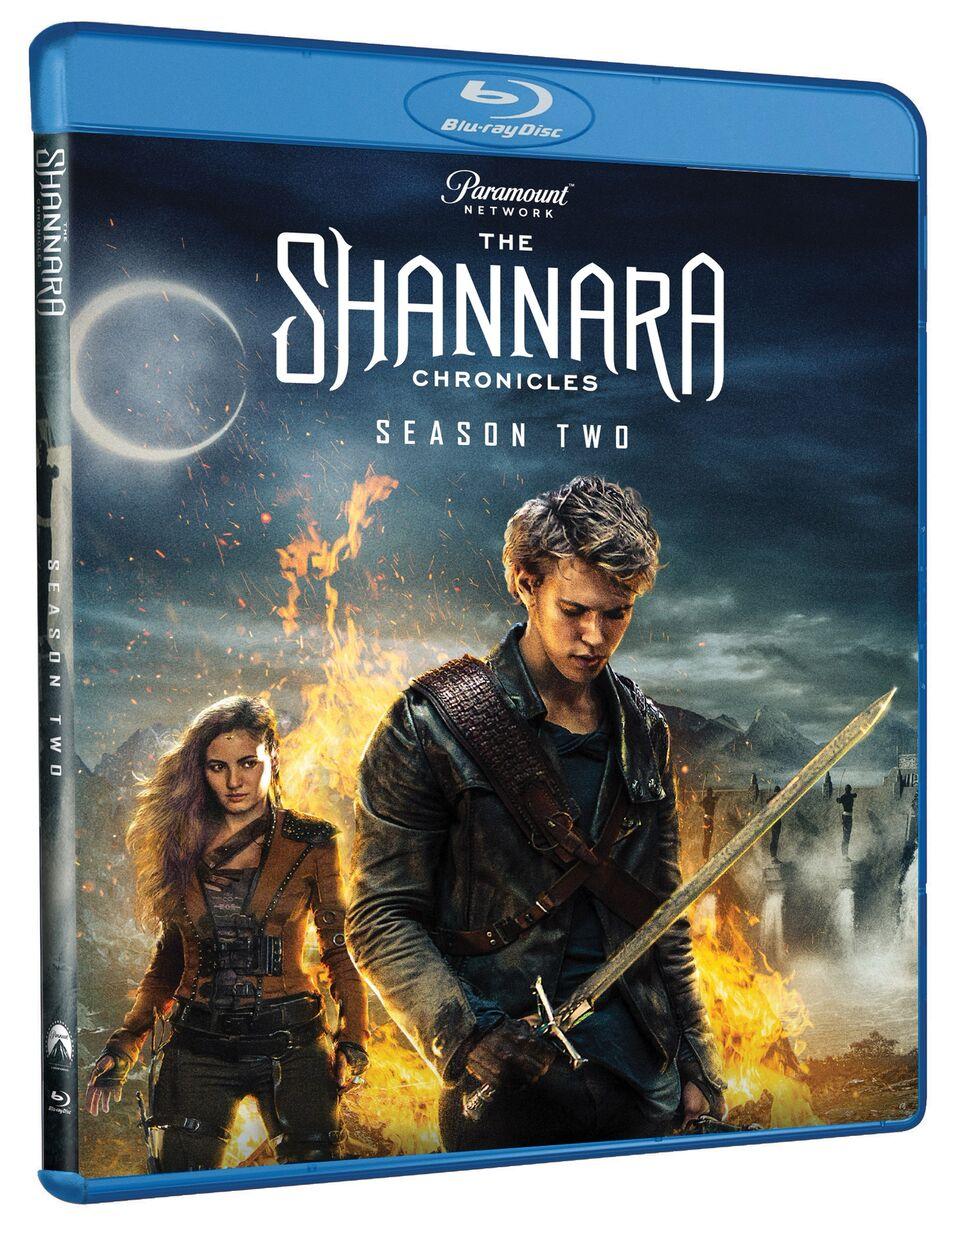 THE SHANNARA CHRONICLES SEASON 2 Blu-ray